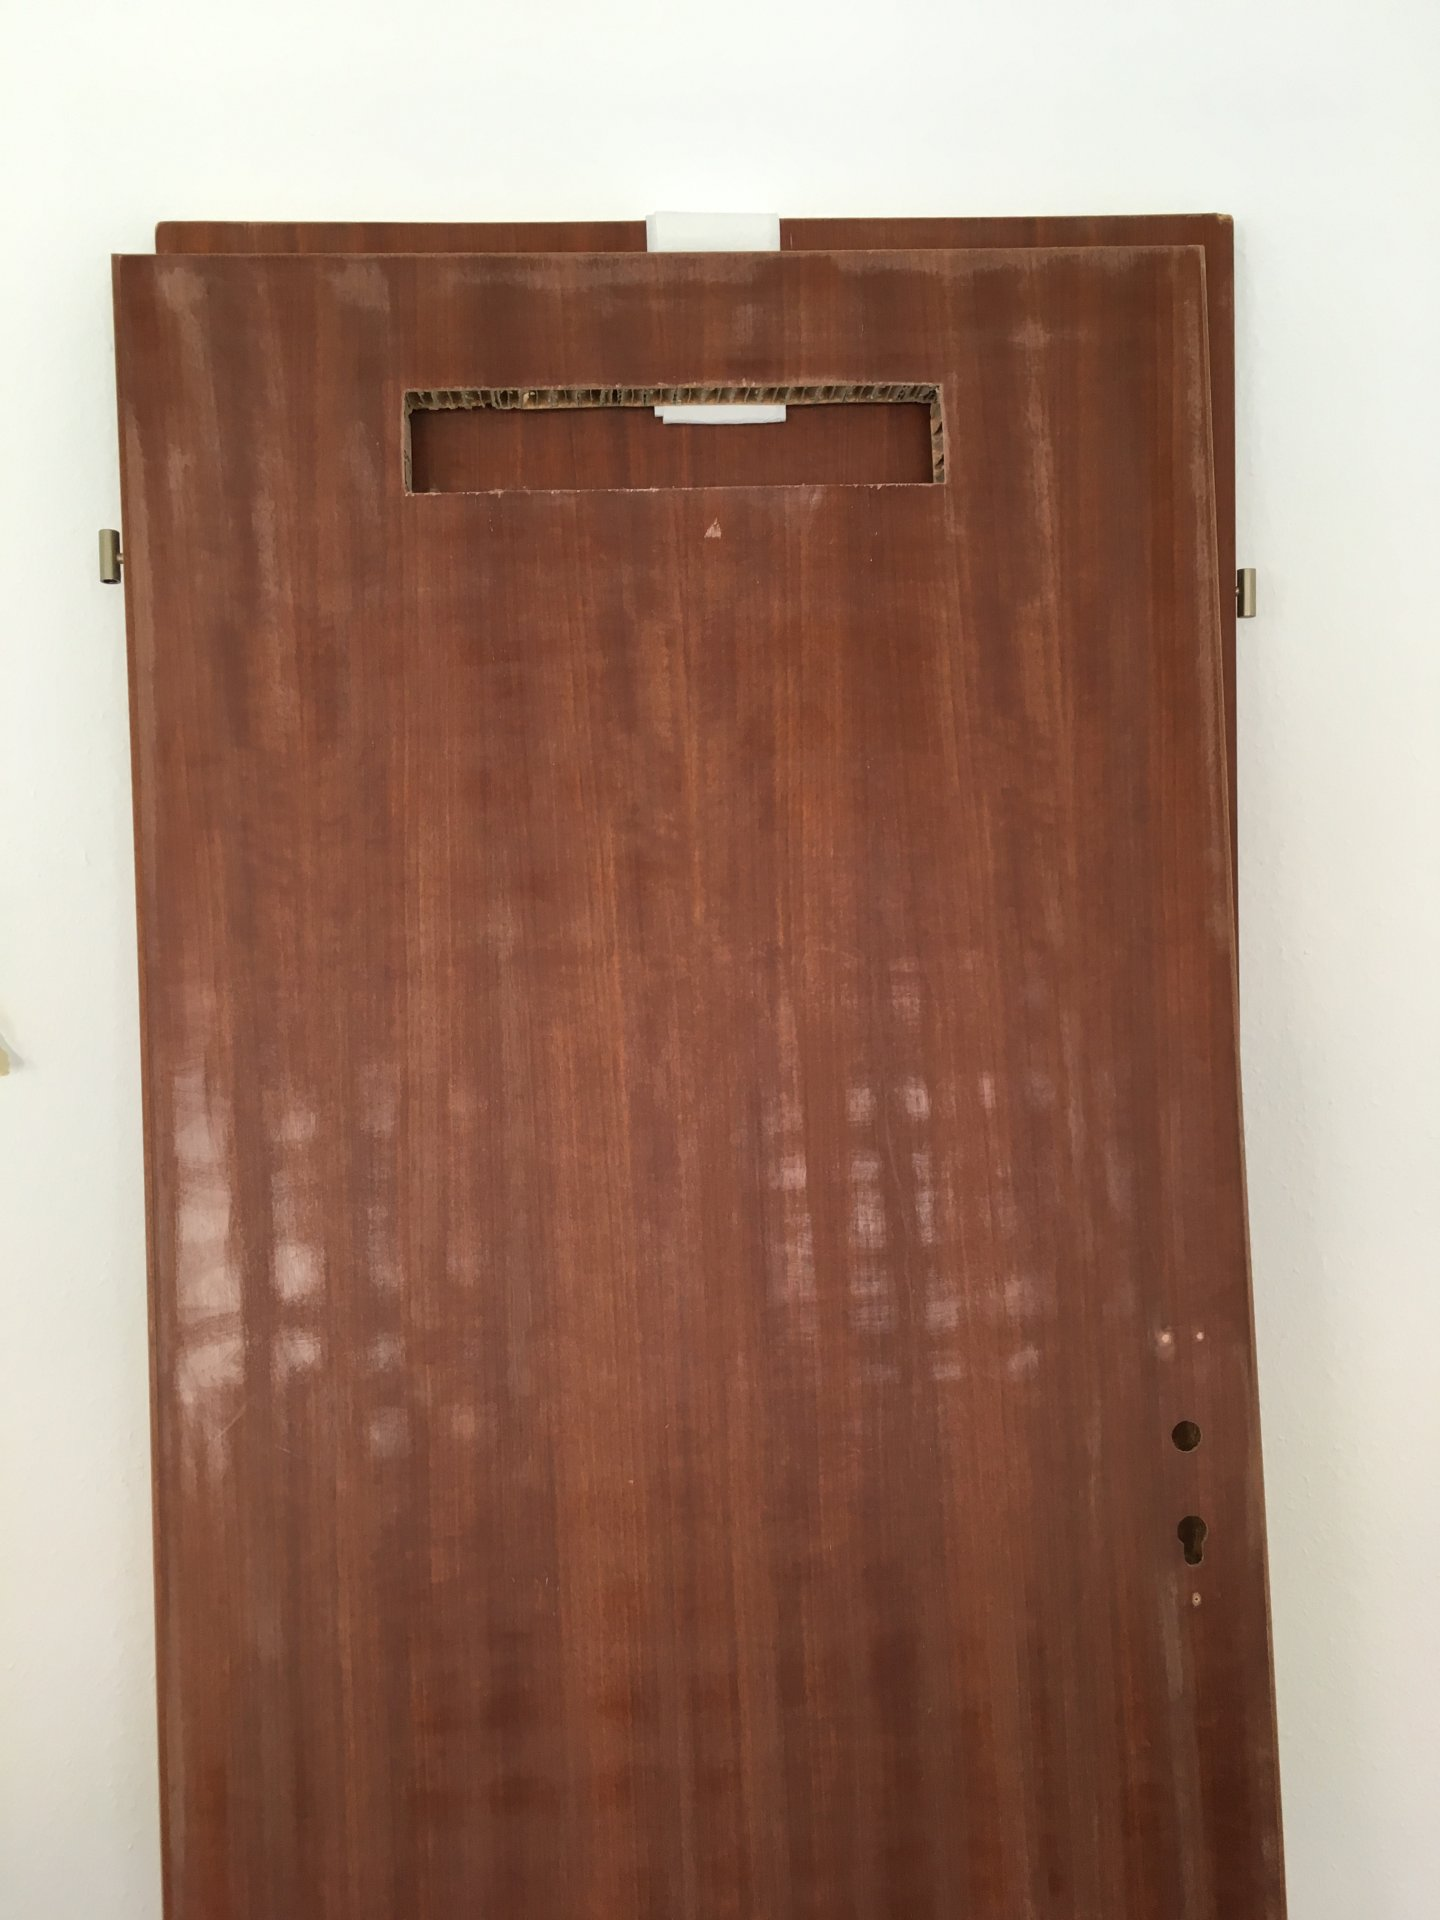 Fabulous Braune Holzfurnier-Tür weiß lackieren PV24